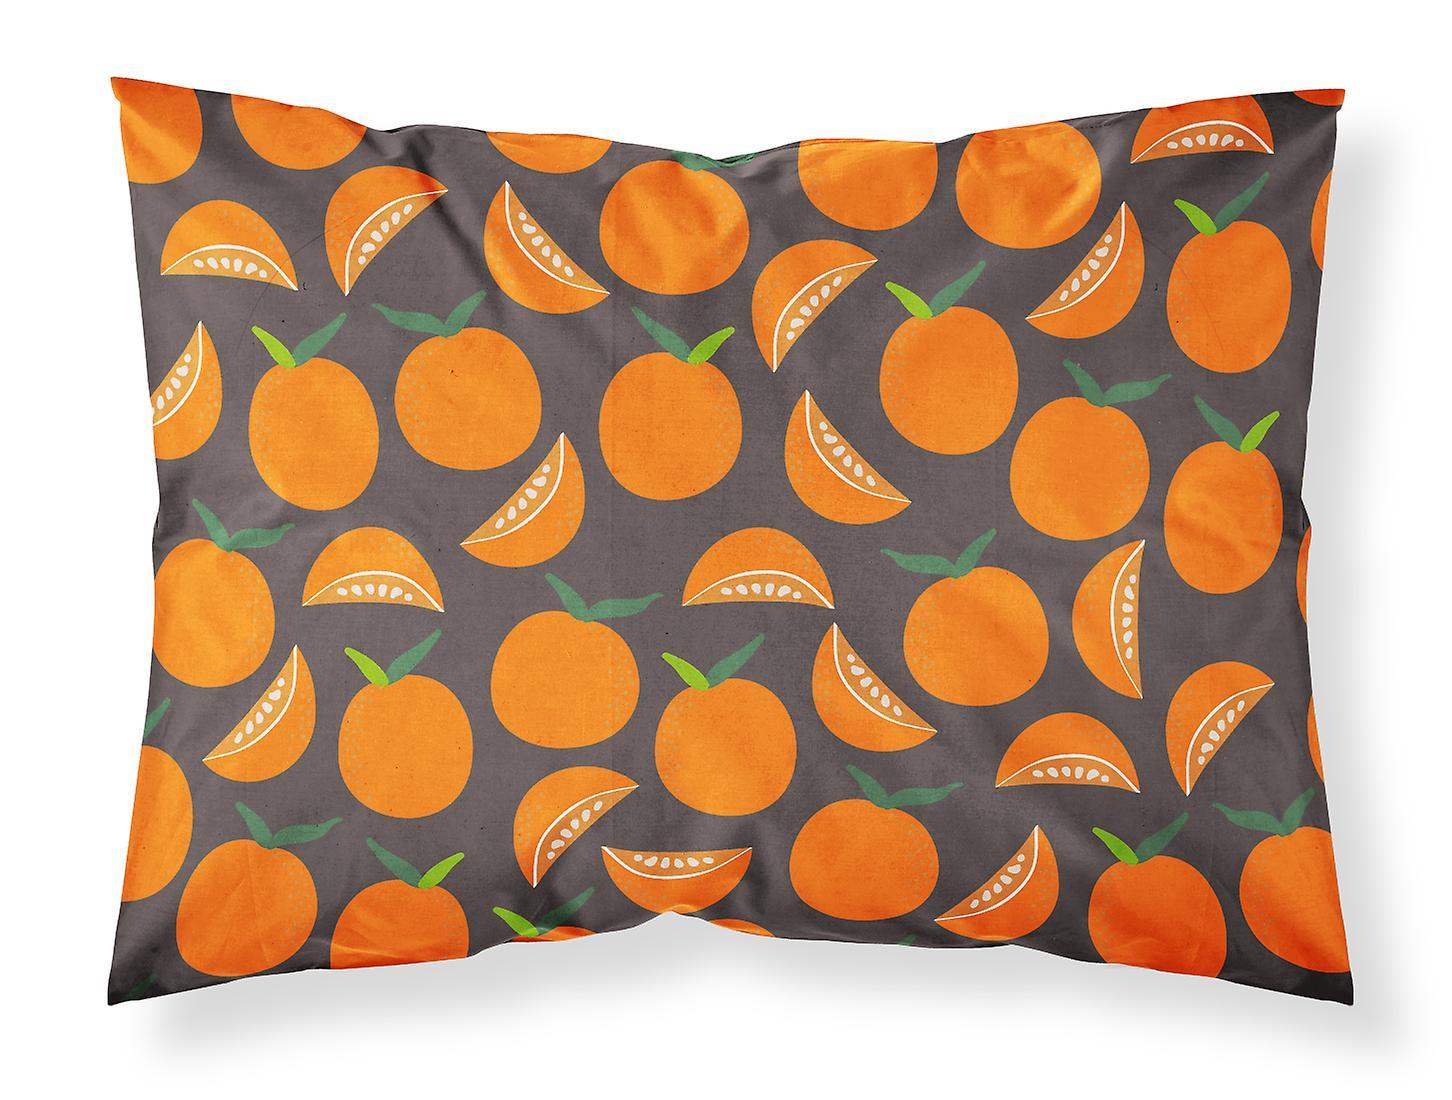 Standard Bb5142pillowcase Carolines Tissu Gris Sur D'oreiller Trésors Oranges Taie 4jqARL53